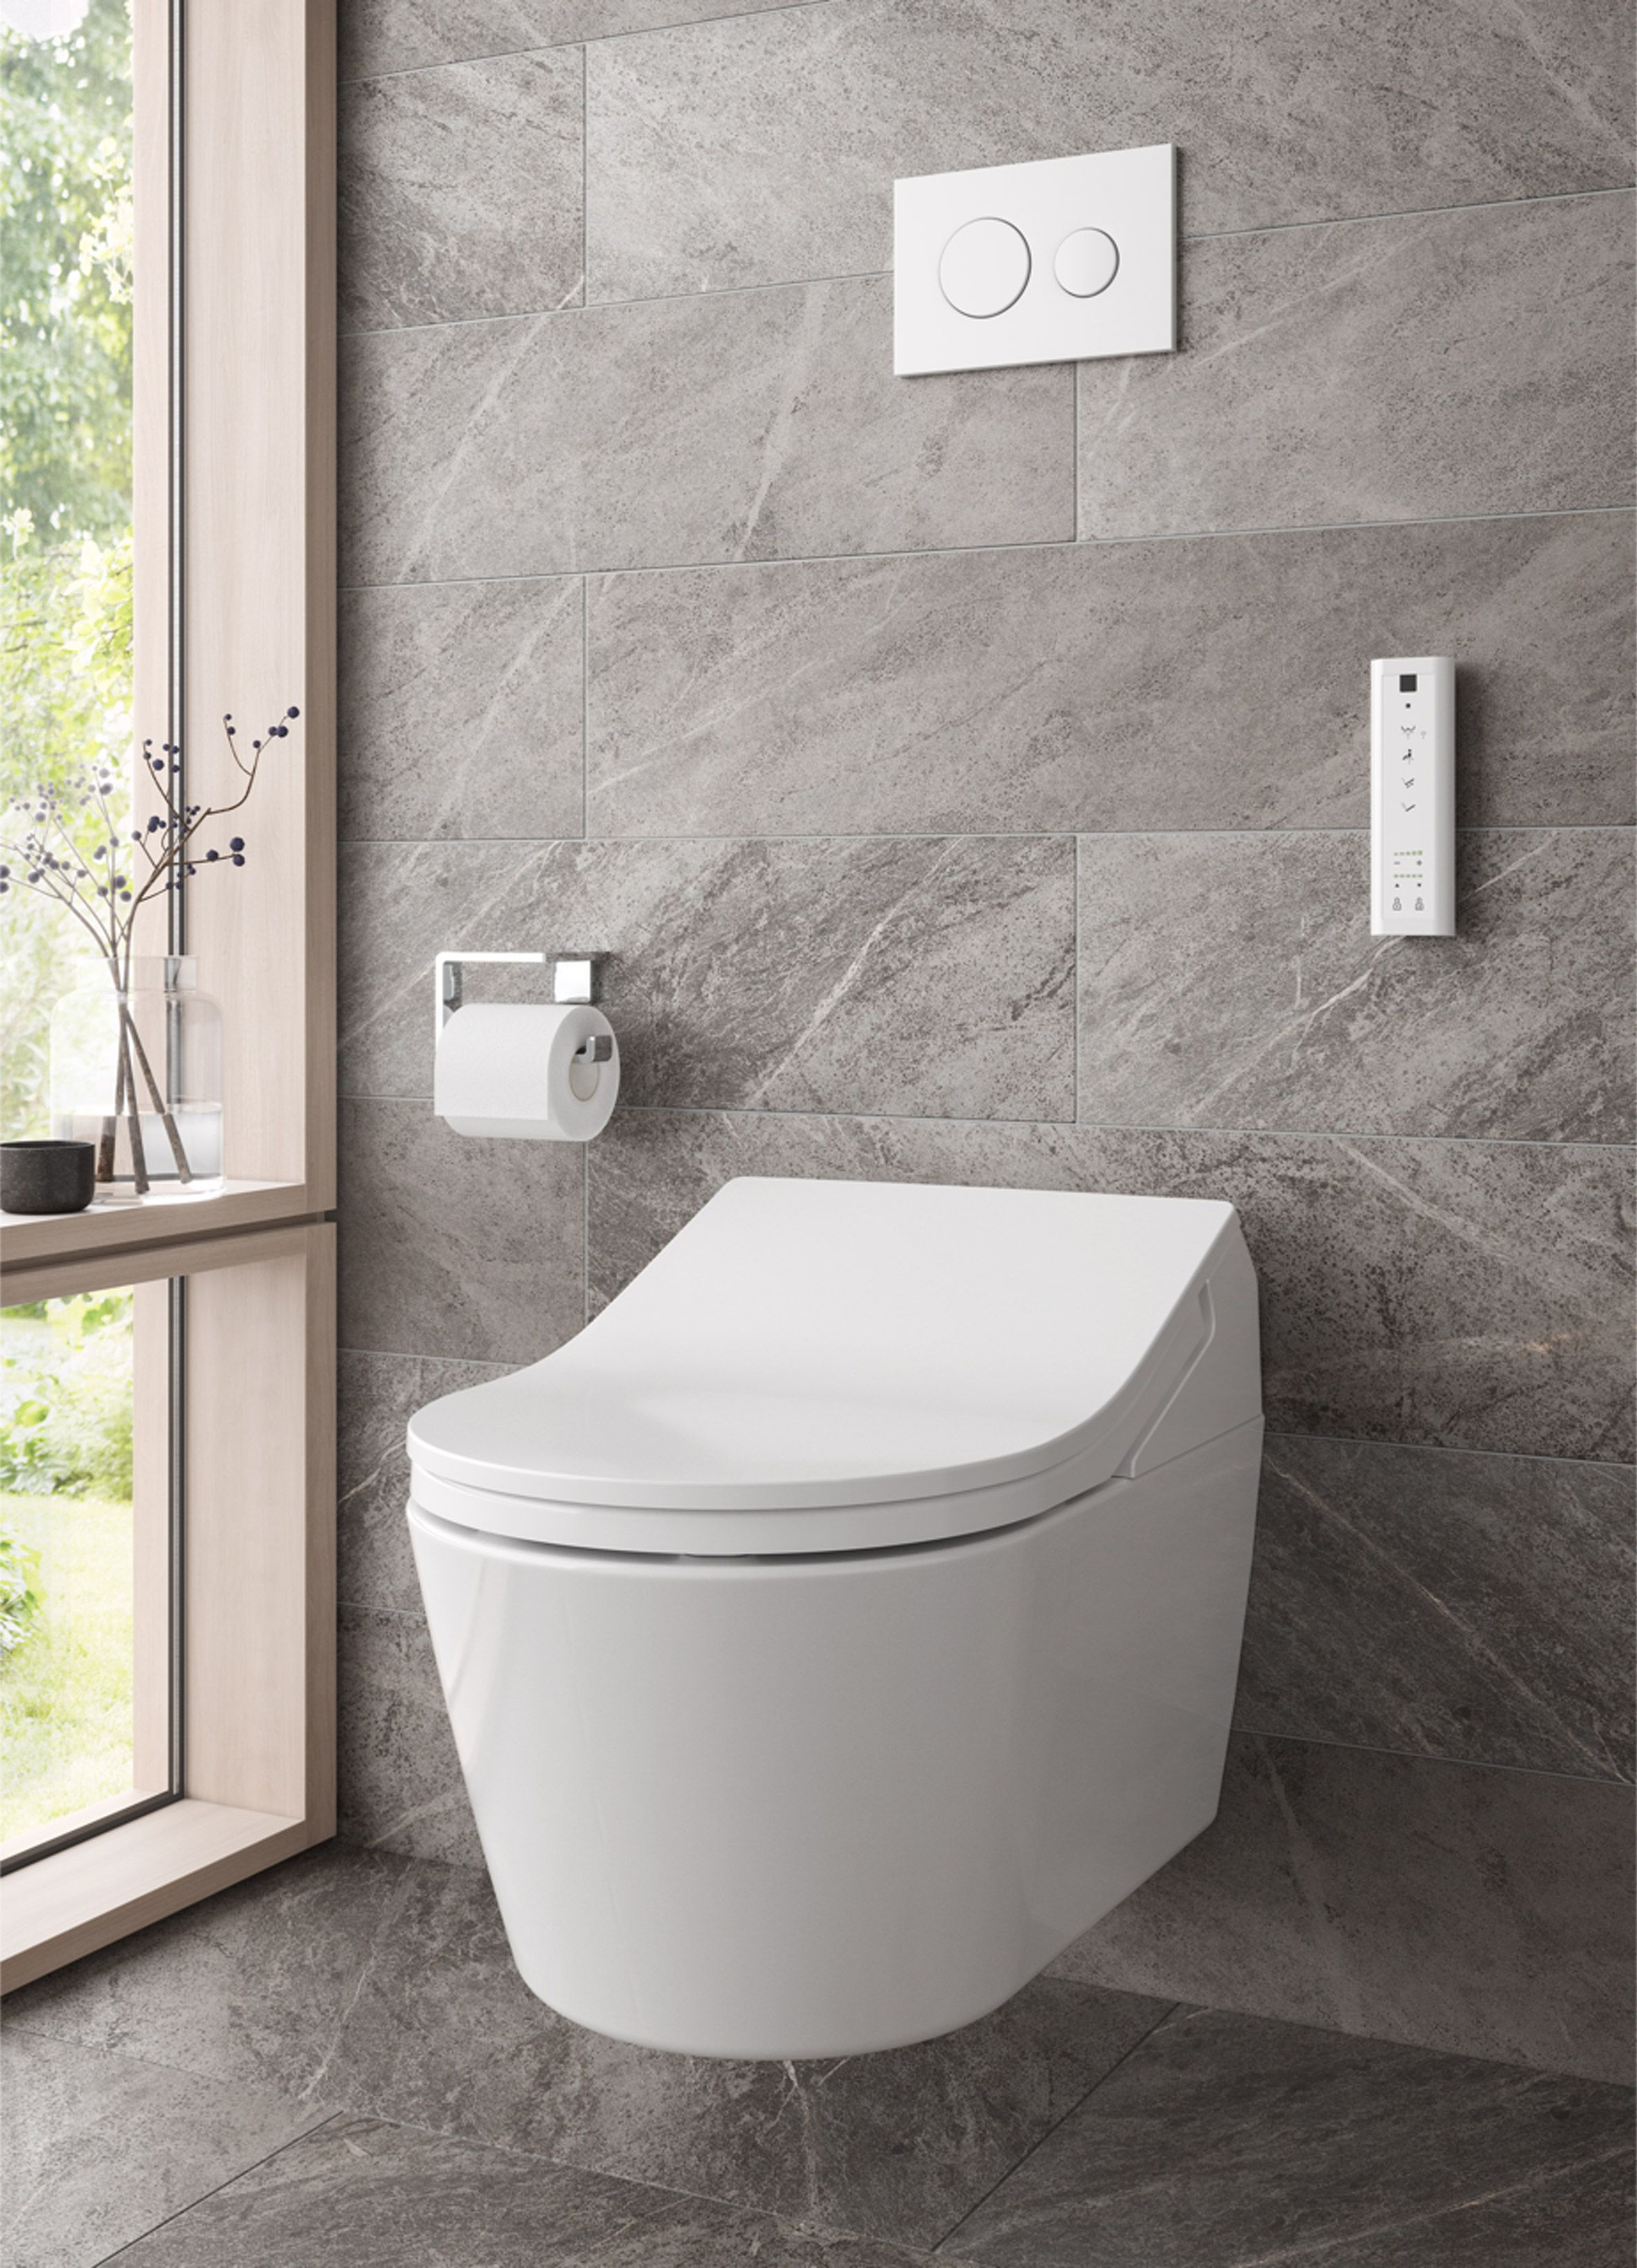 David Morley To Discuss Toto Bathrooms